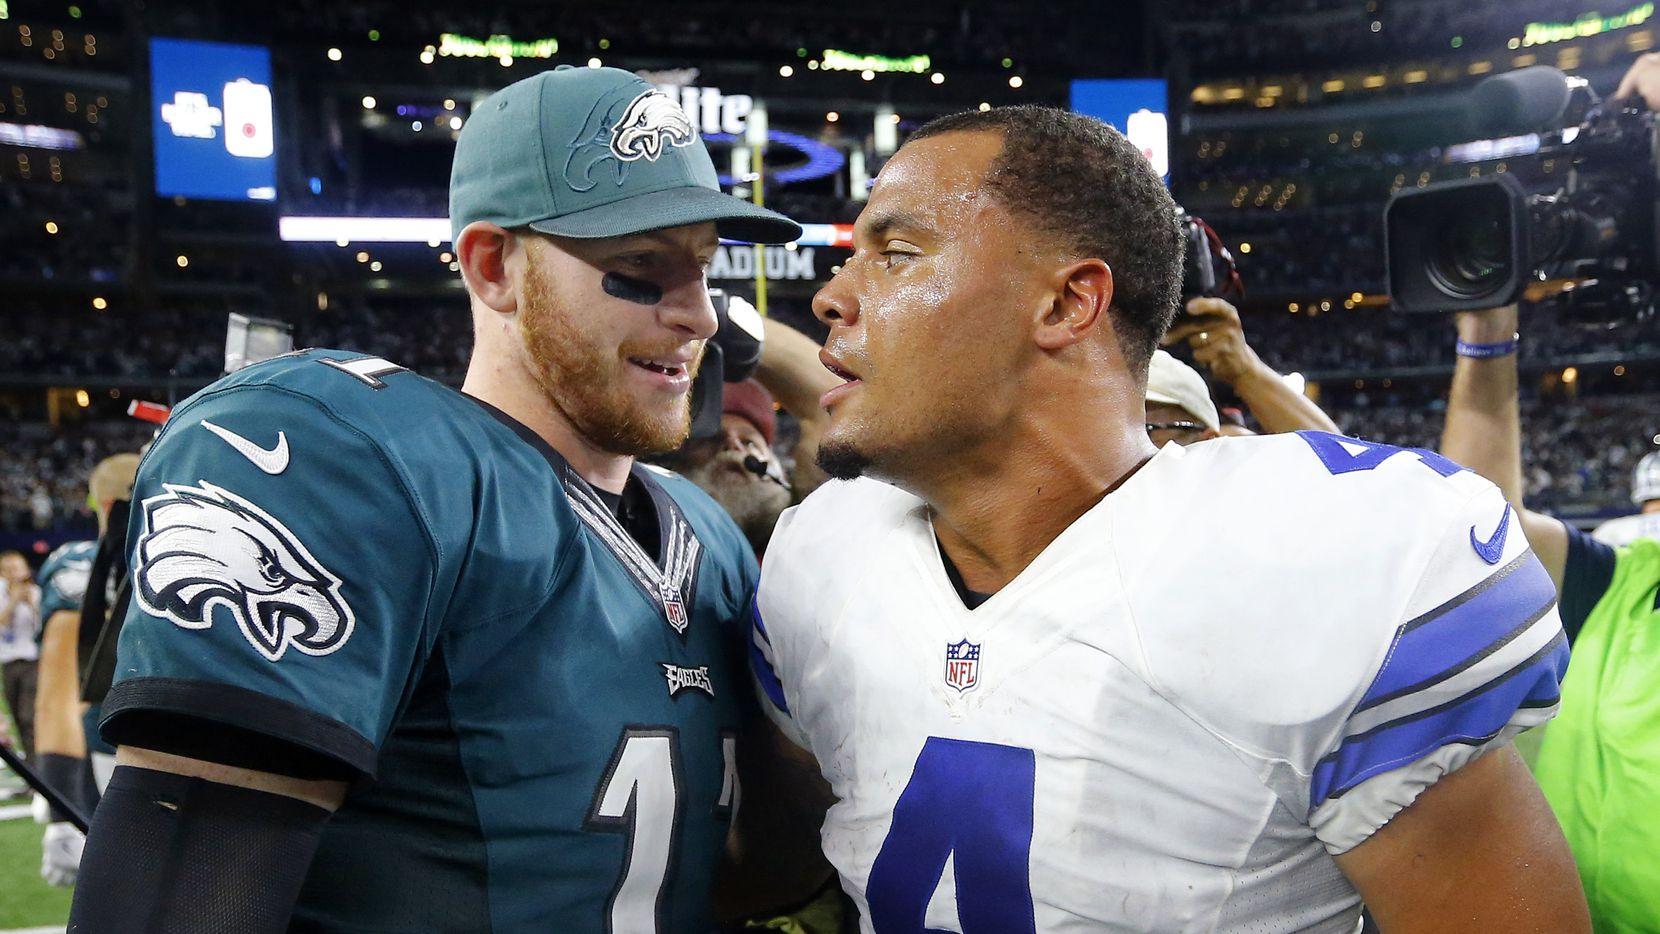 Philadelphia Eagles quarterback Carson Wentz (11) congratulates Dallas Cowboys quarterback Dak Prescott (4) after the 29-23 overtime win at AT&T Stadium in Arlington, Texas, Sunday, October 30, 2016. The Cowboys won, 29-23. (Tom Fox/The Dallas Morning News)